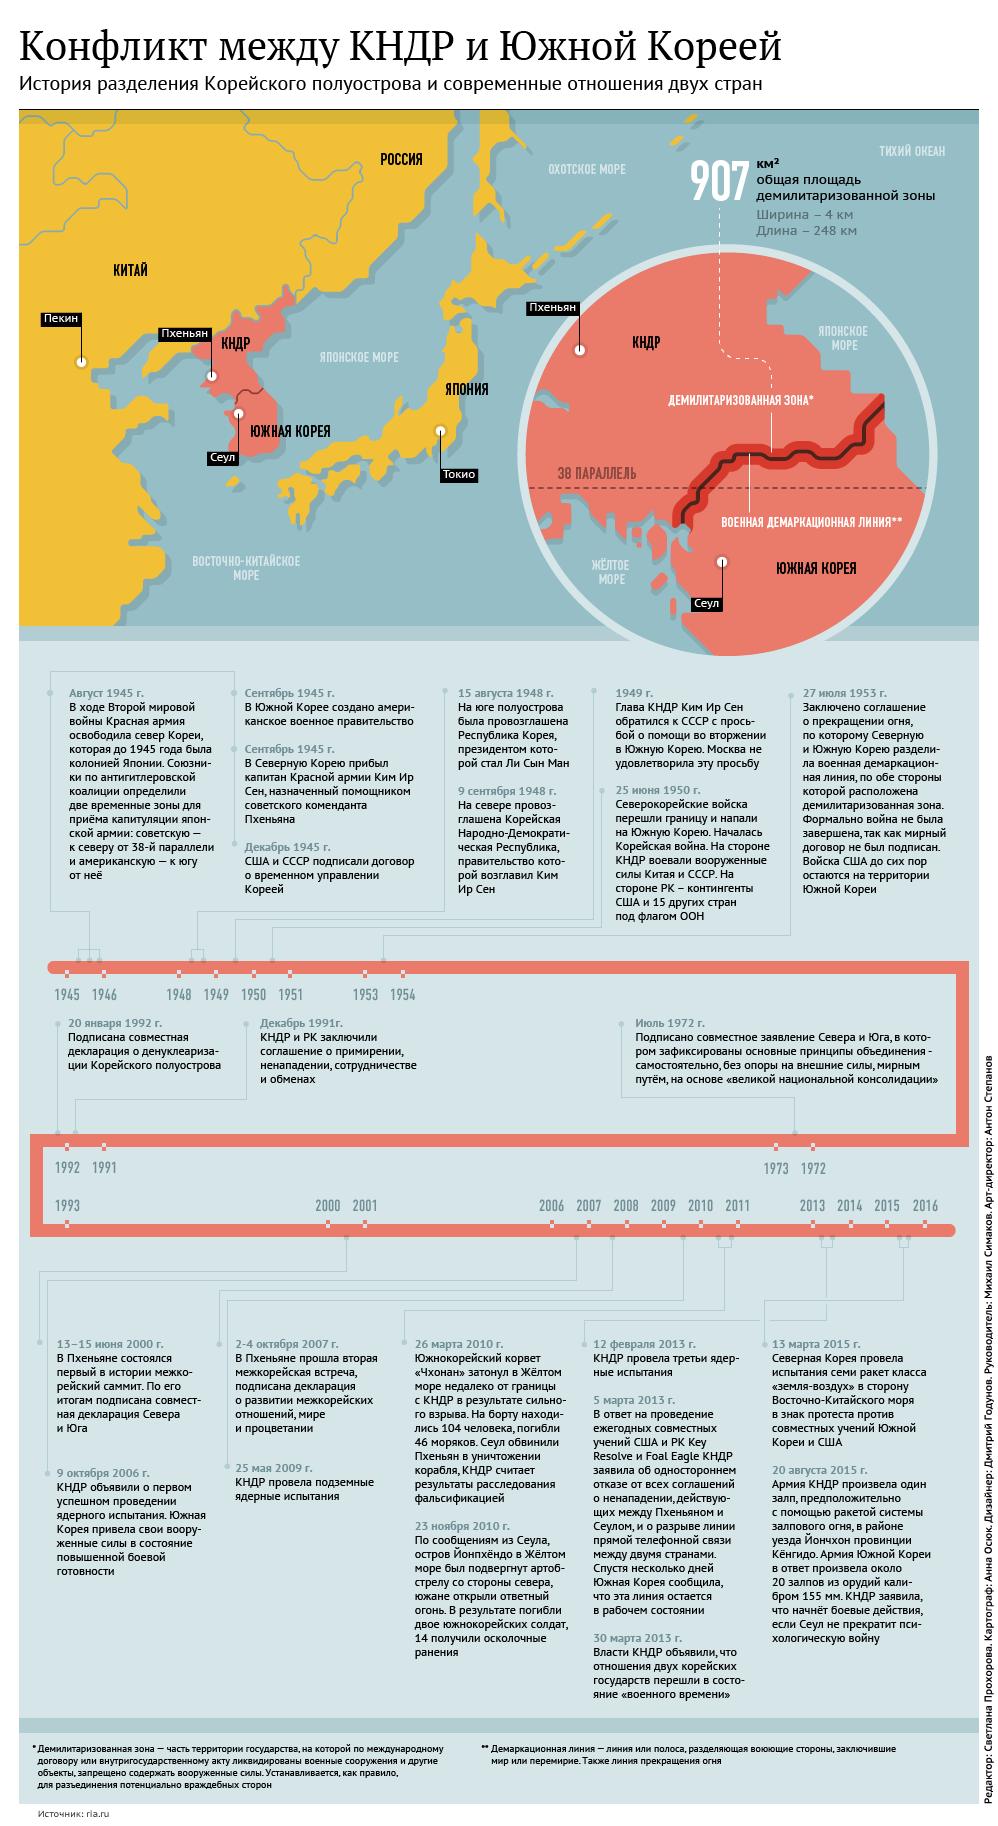 Ситуация на Корейском полуострове